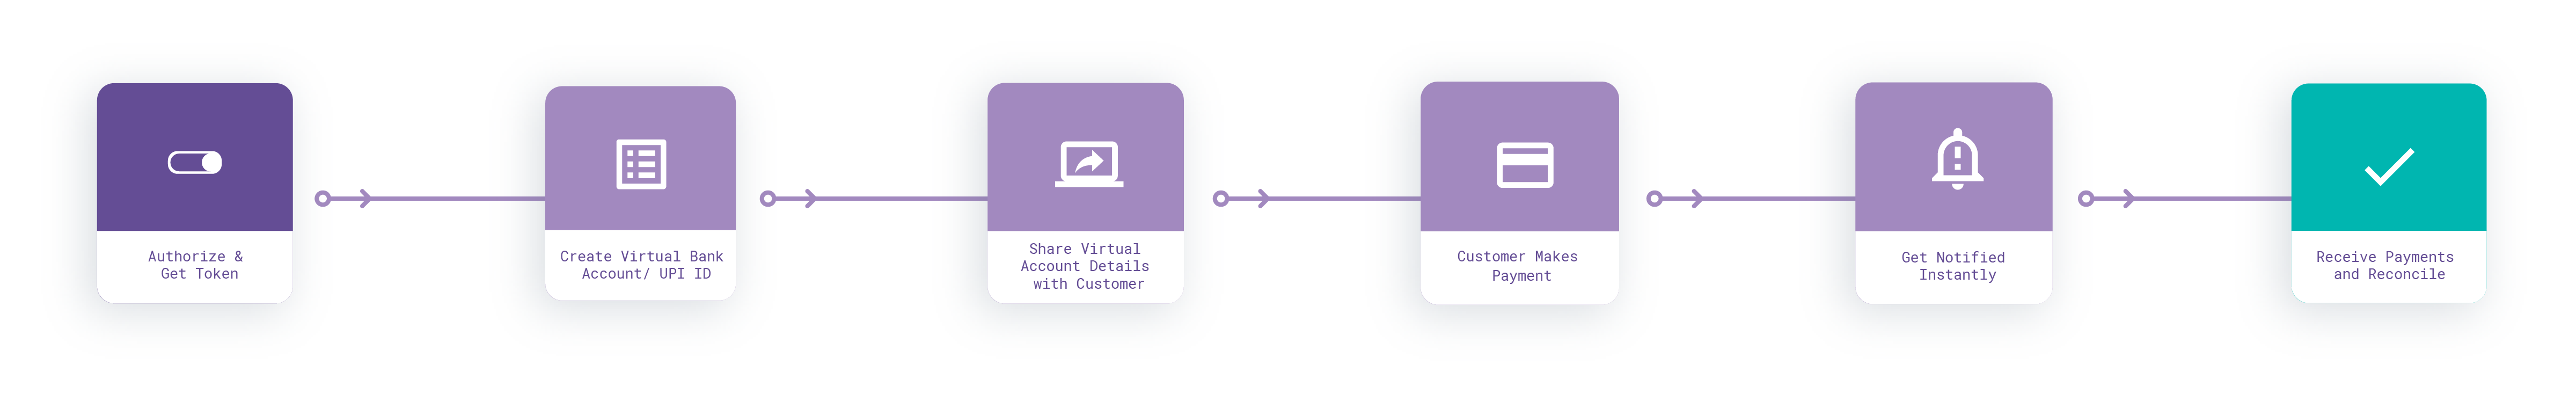 Auto Collect Integration Flow